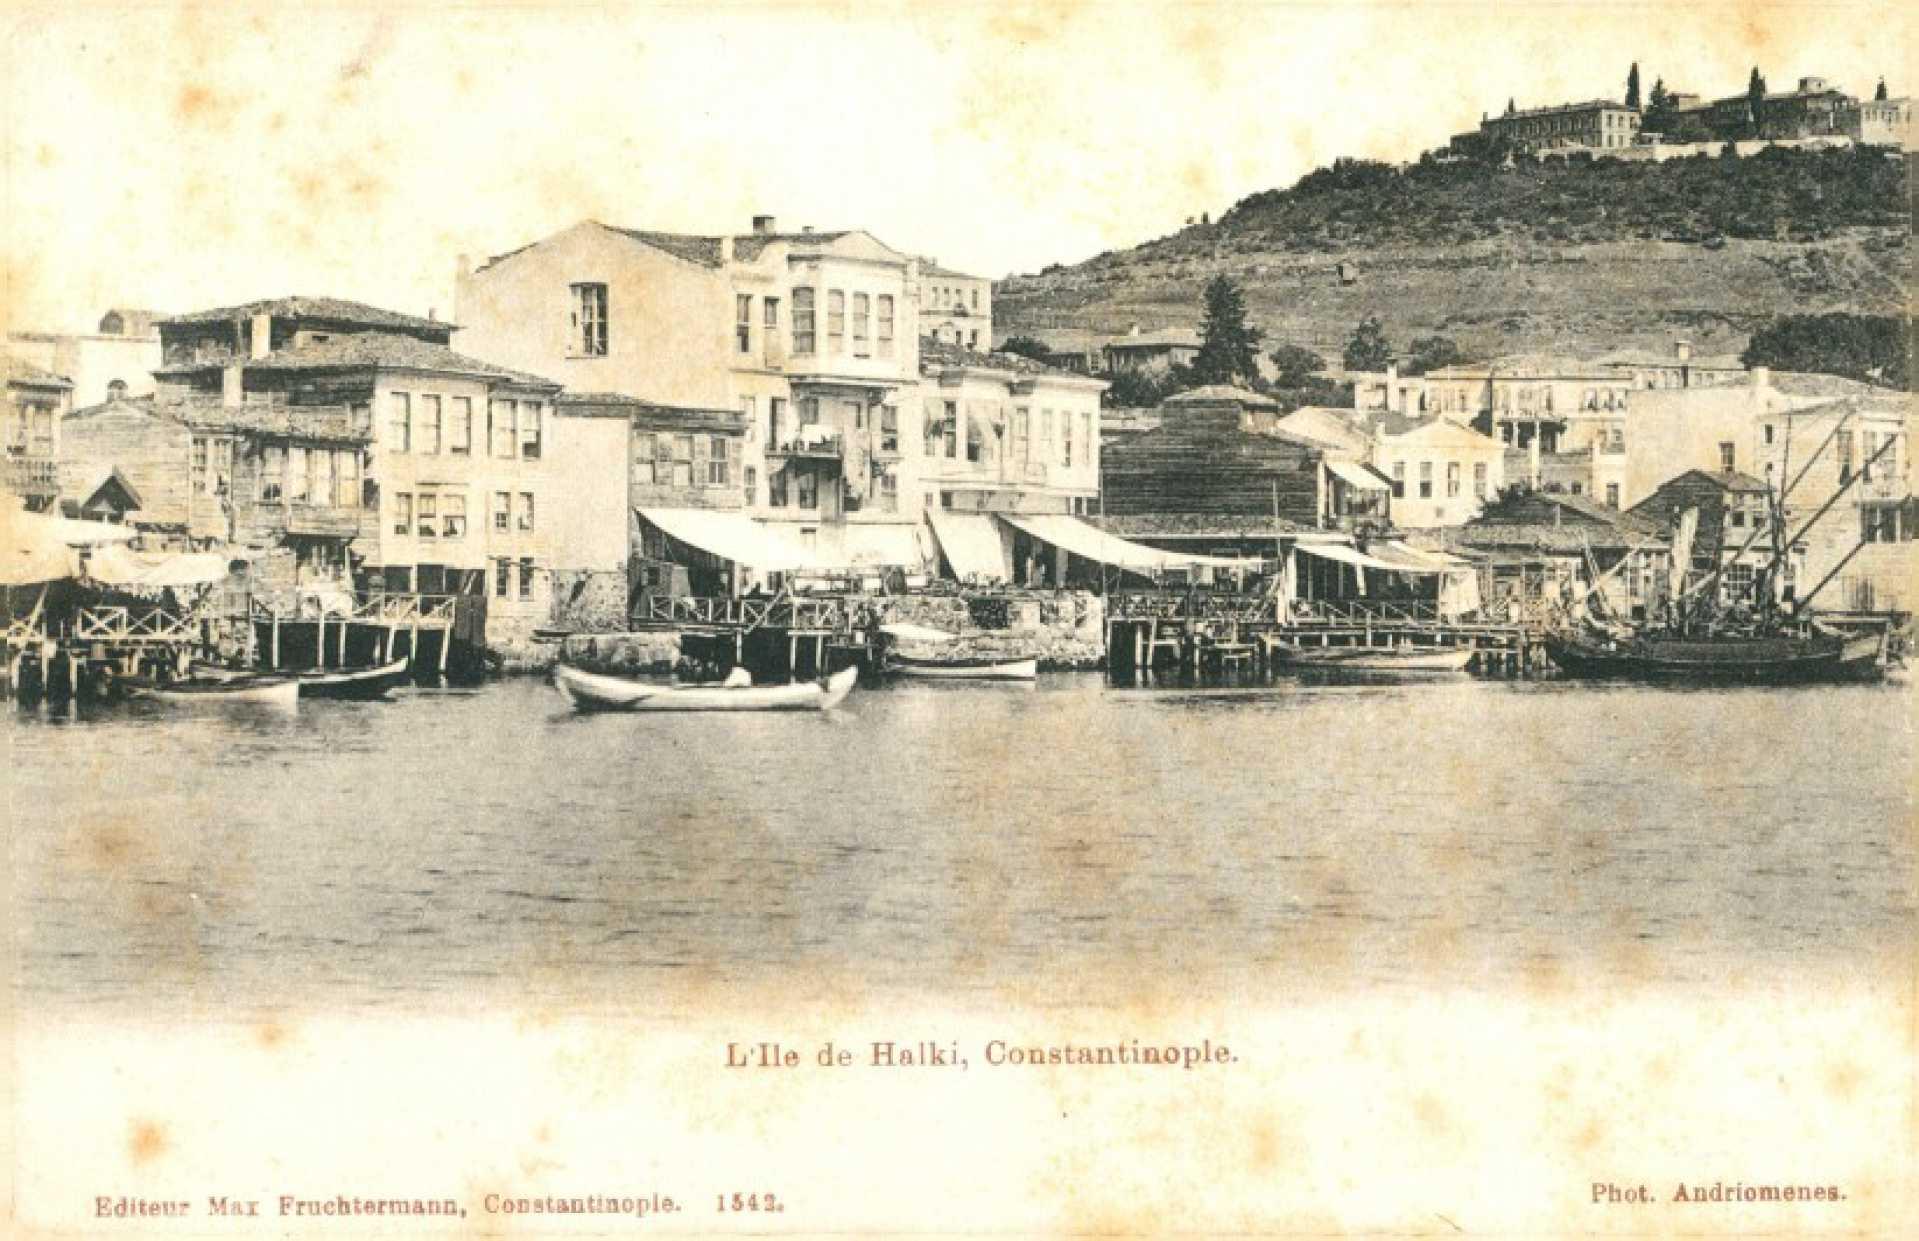 L'Ile de Halki